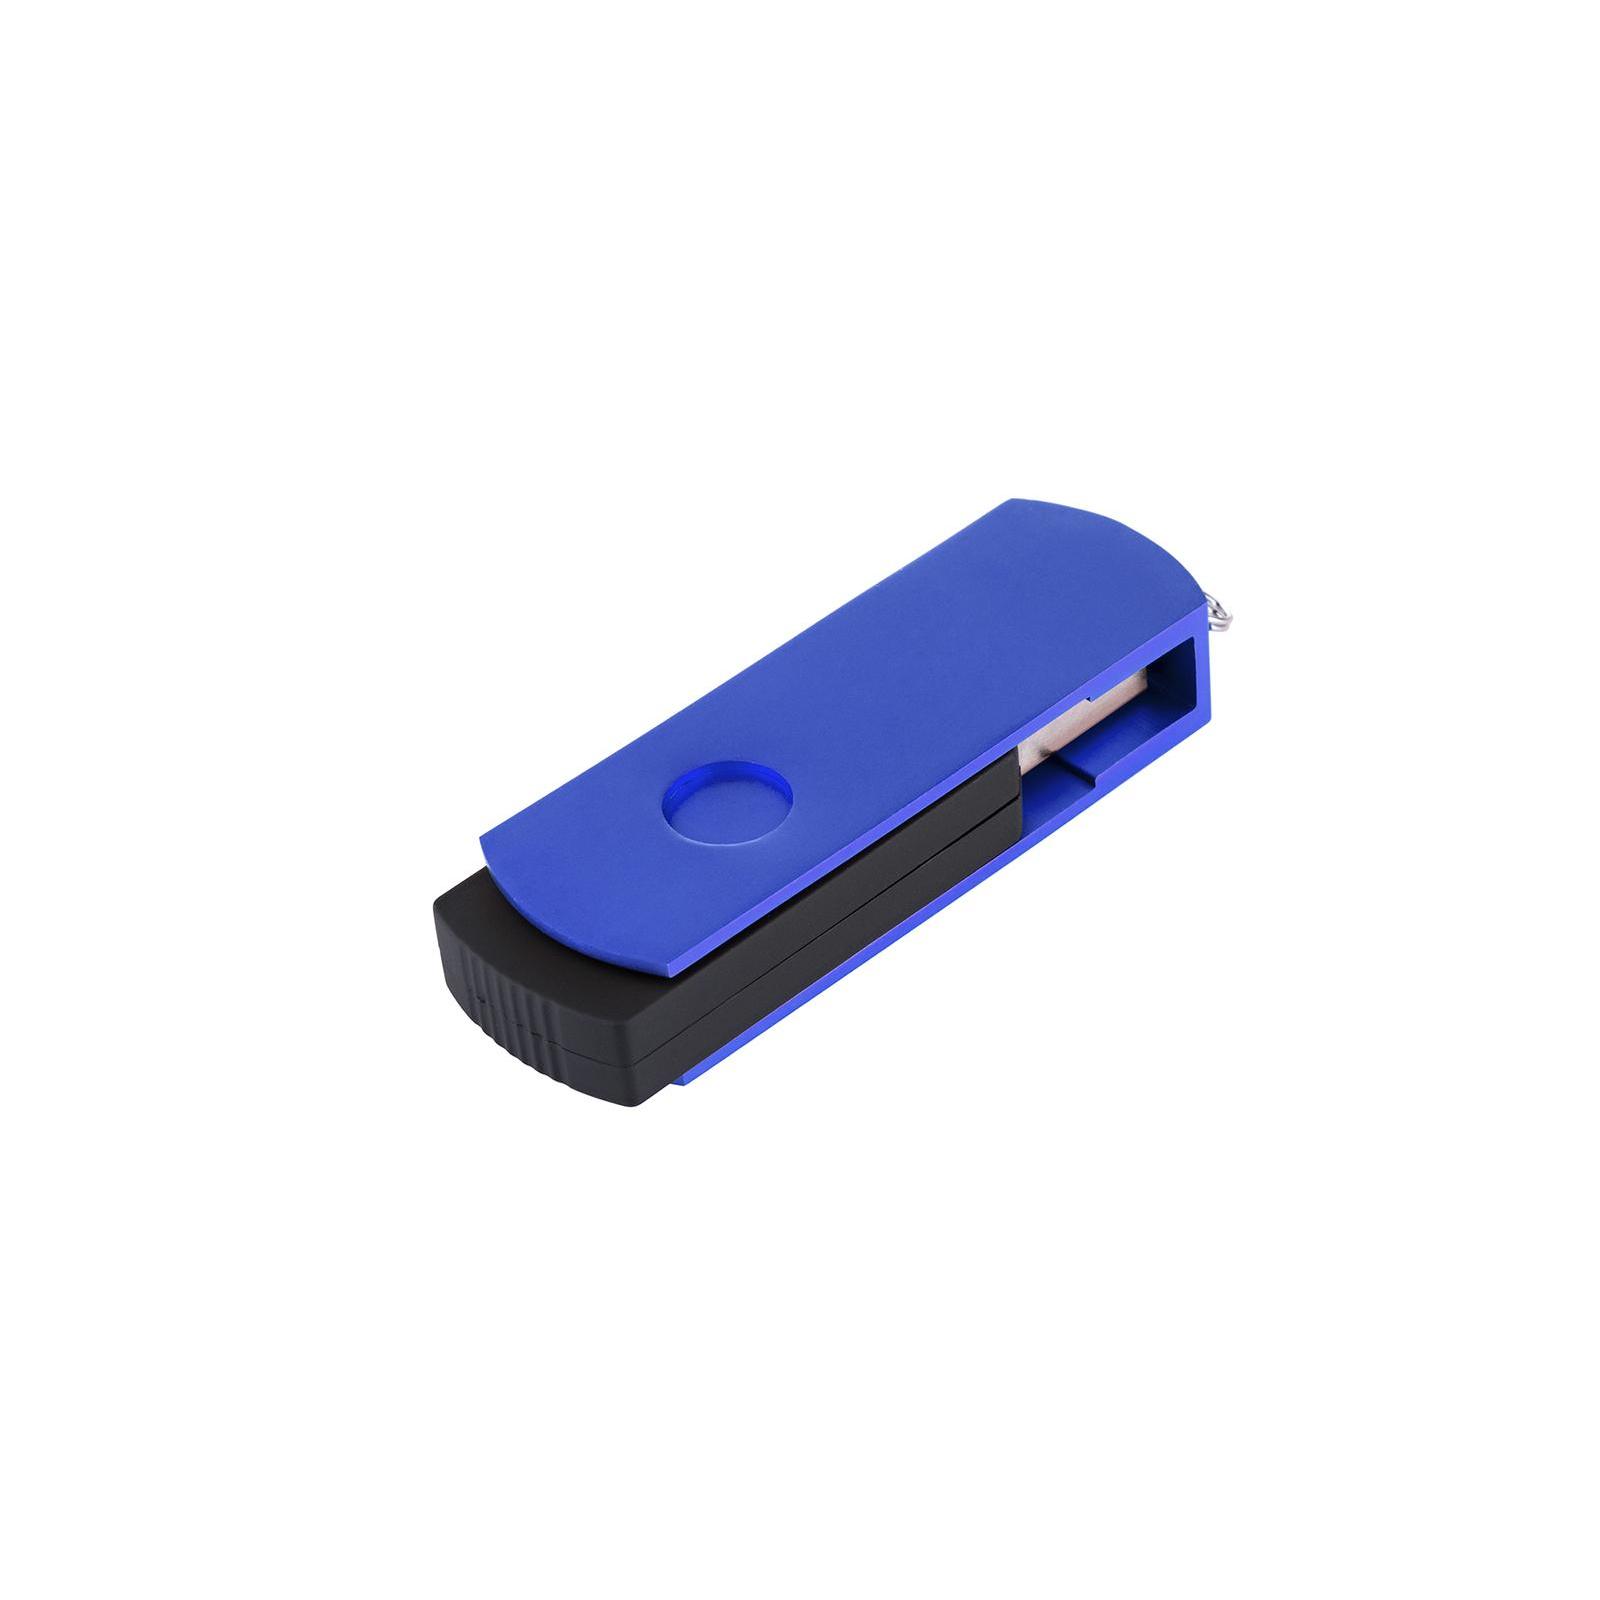 USB флеш накопитель eXceleram 8GB P2 Series Blue/Black USB 2.0 (EXP2U2BLB08) изображение 6